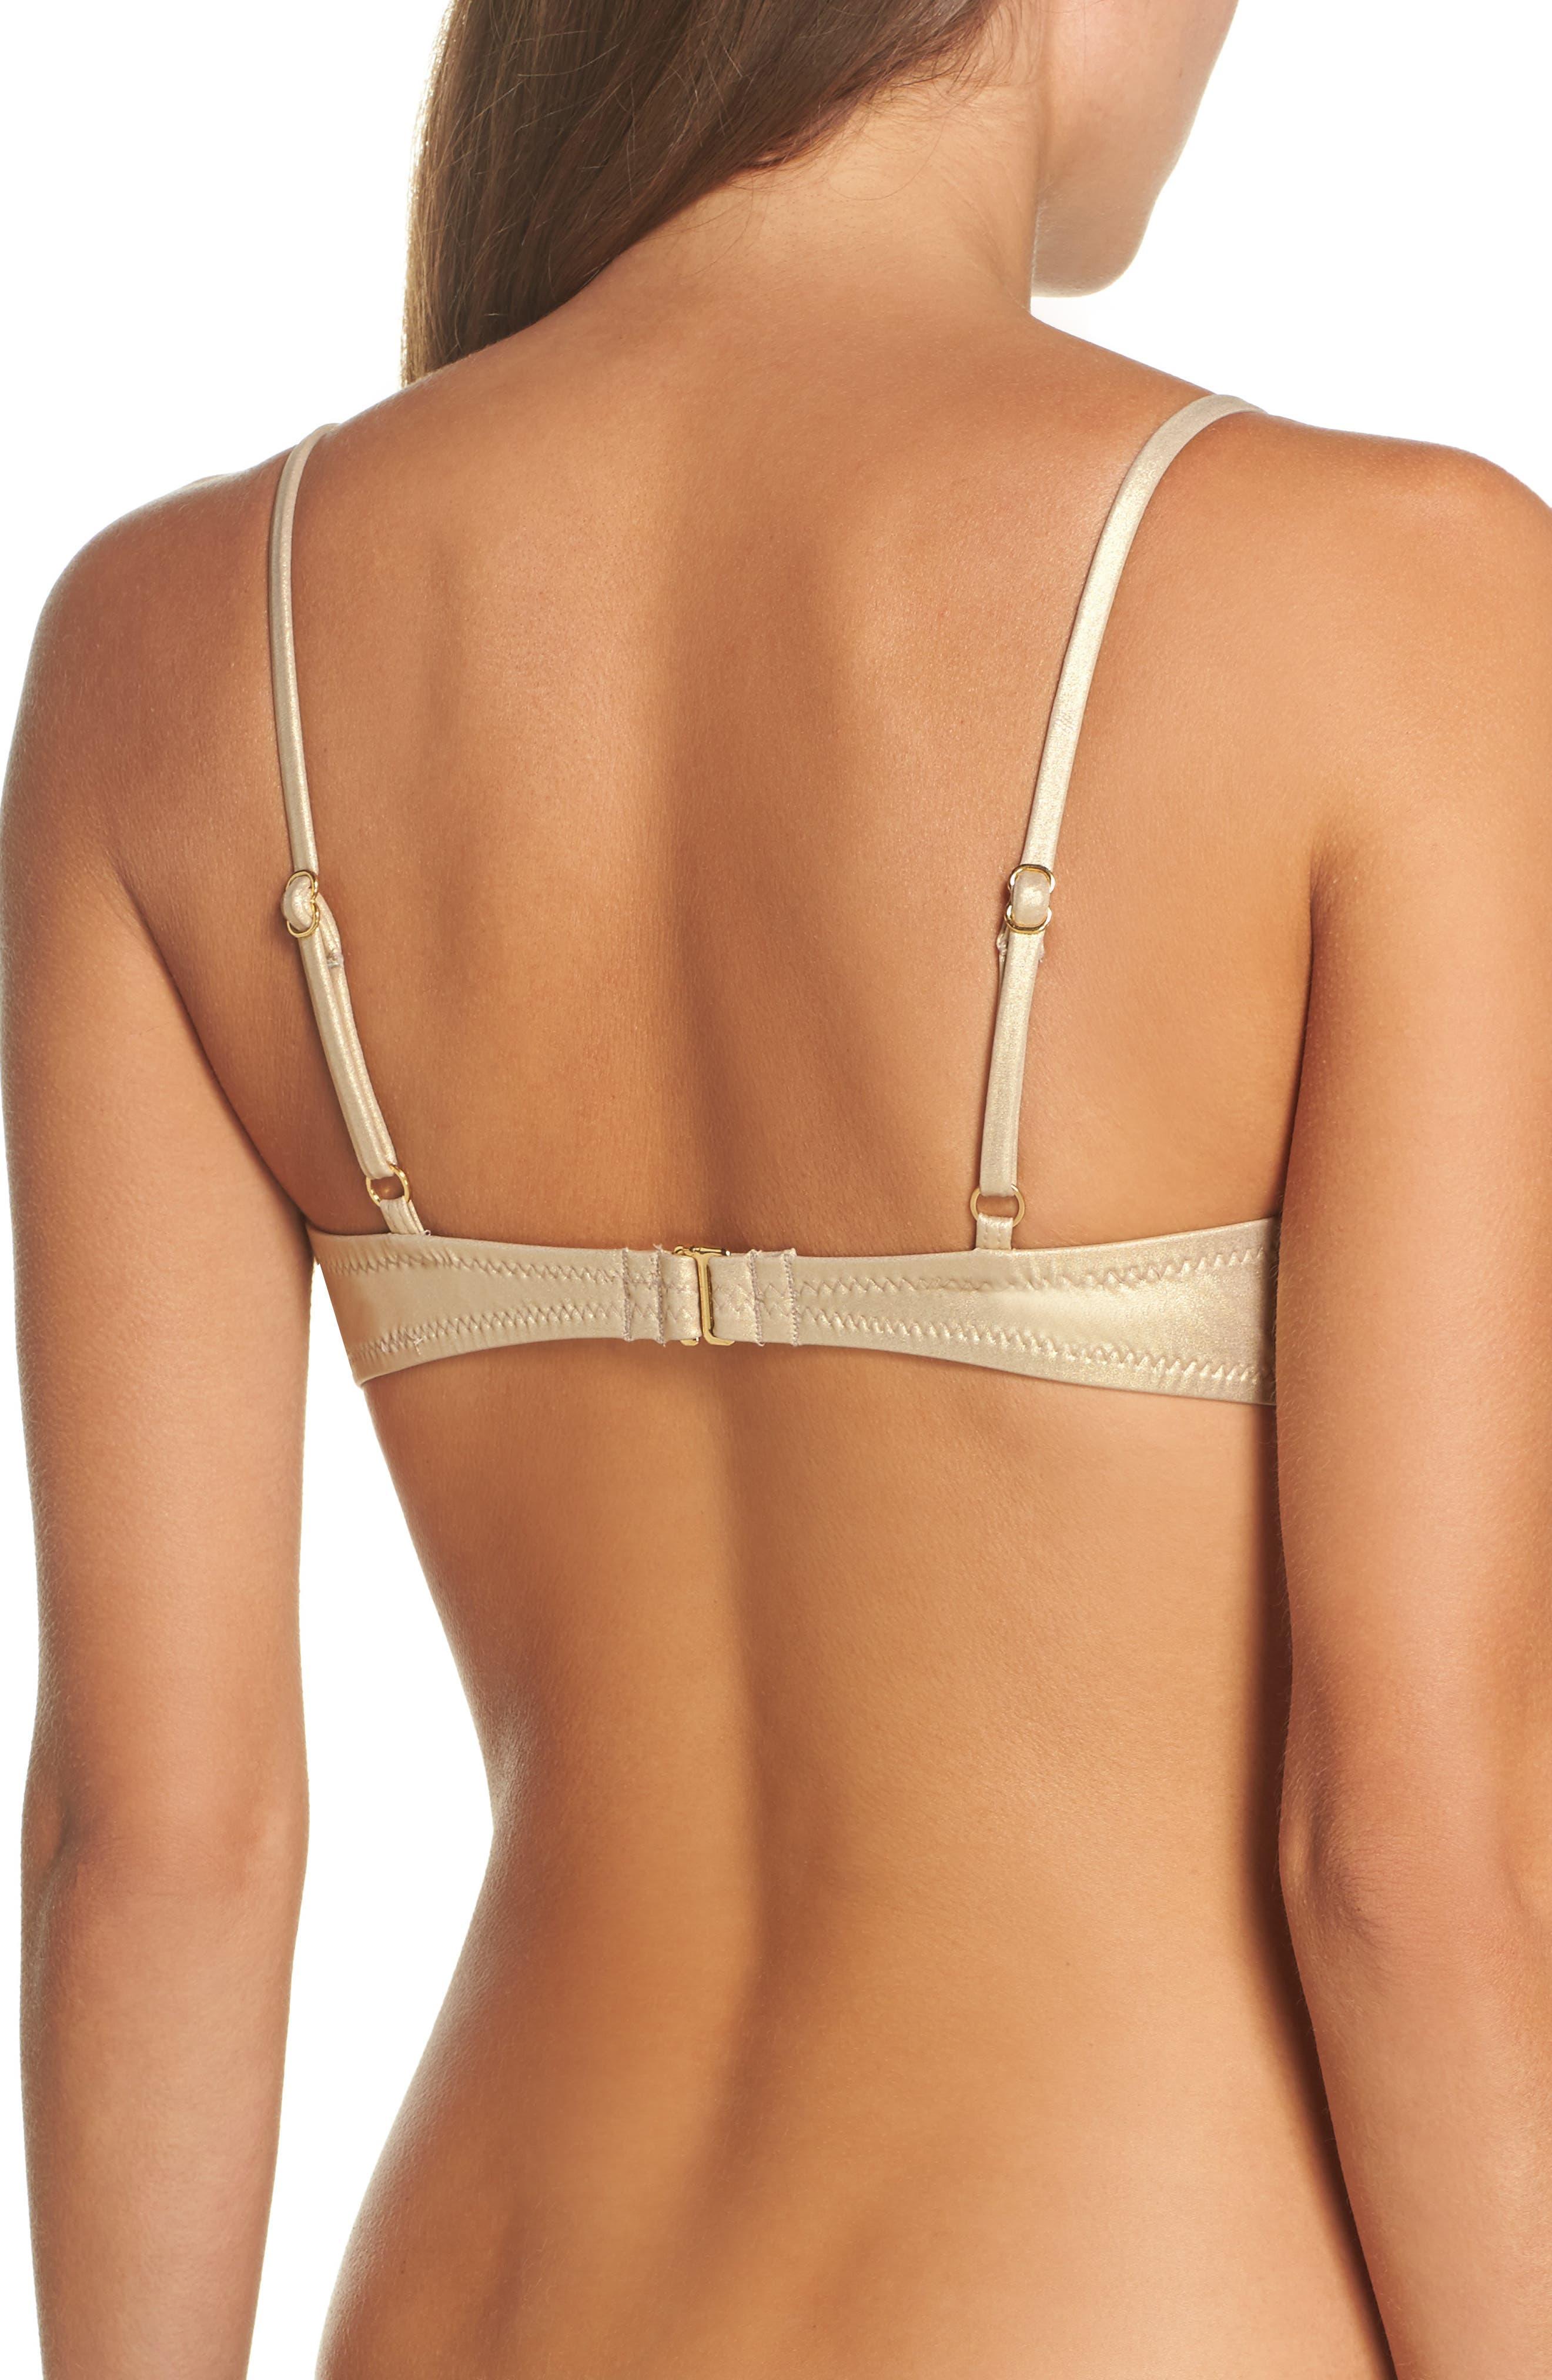 Golden Medallion Bikini Top,                             Alternate thumbnail 2, color,                             Gold